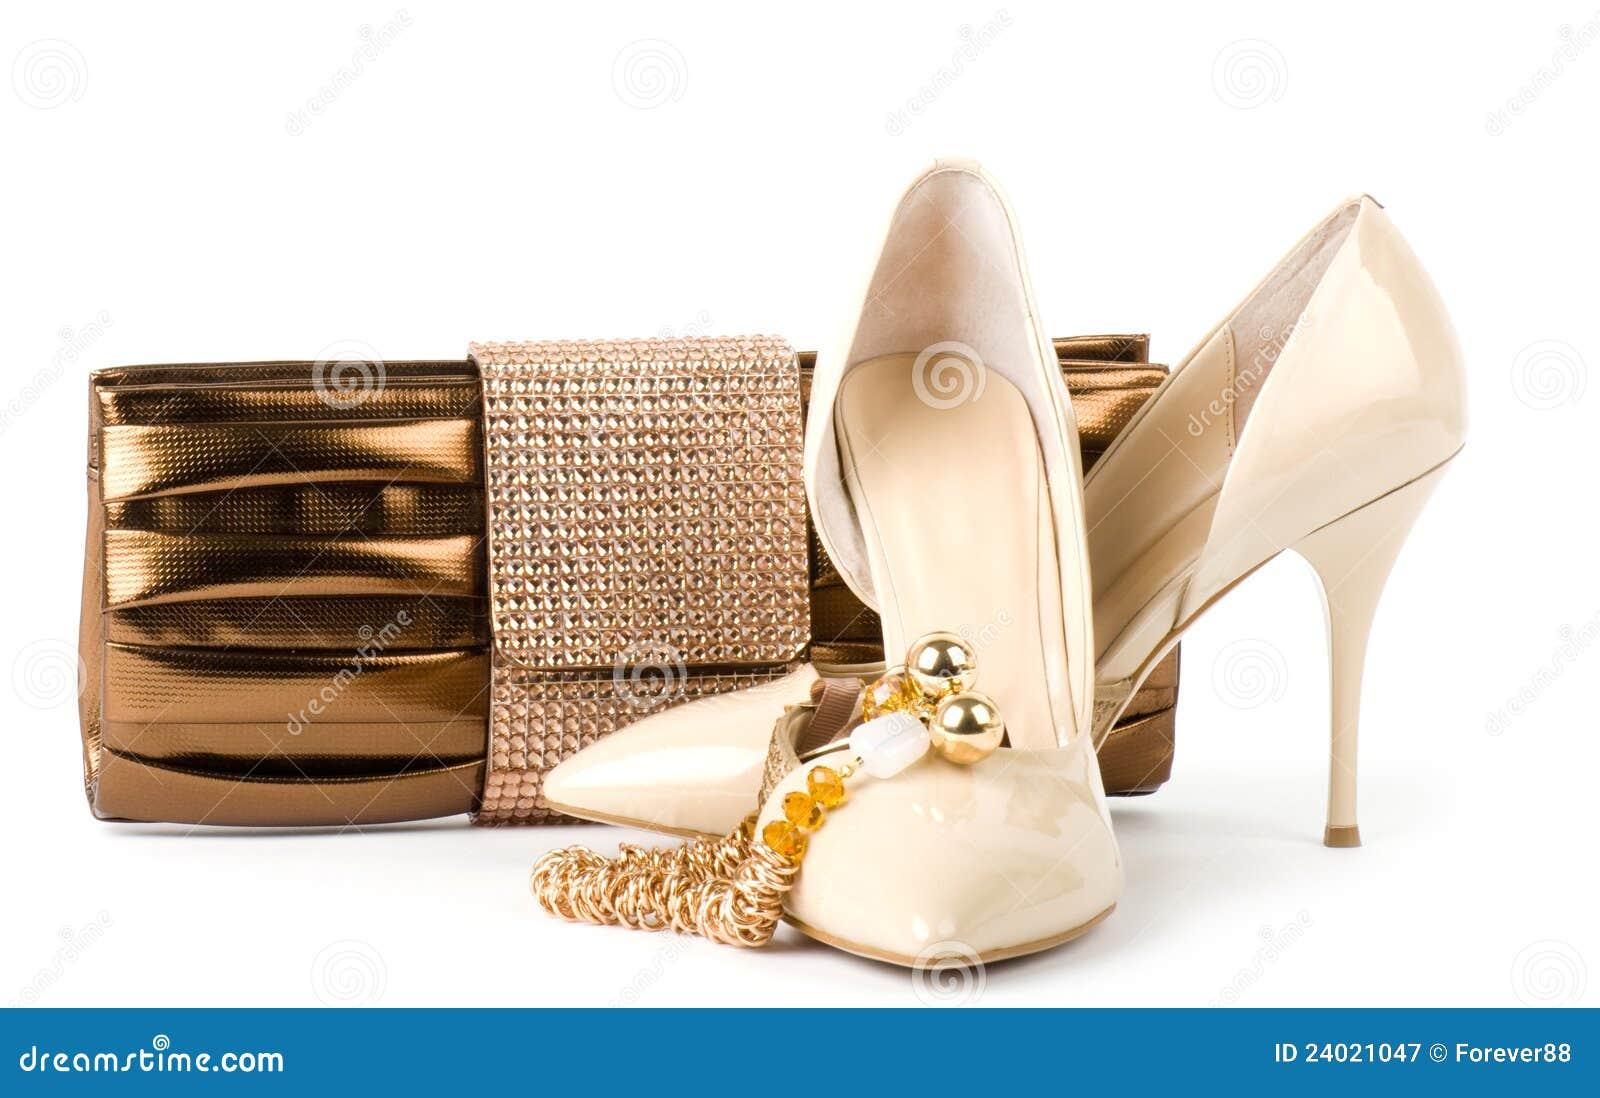 262f86cc3bc χρυσά παπούτσια κοσμήματος τσαντών Στοκ Εικόνα - εικόνα από υψηλός ...